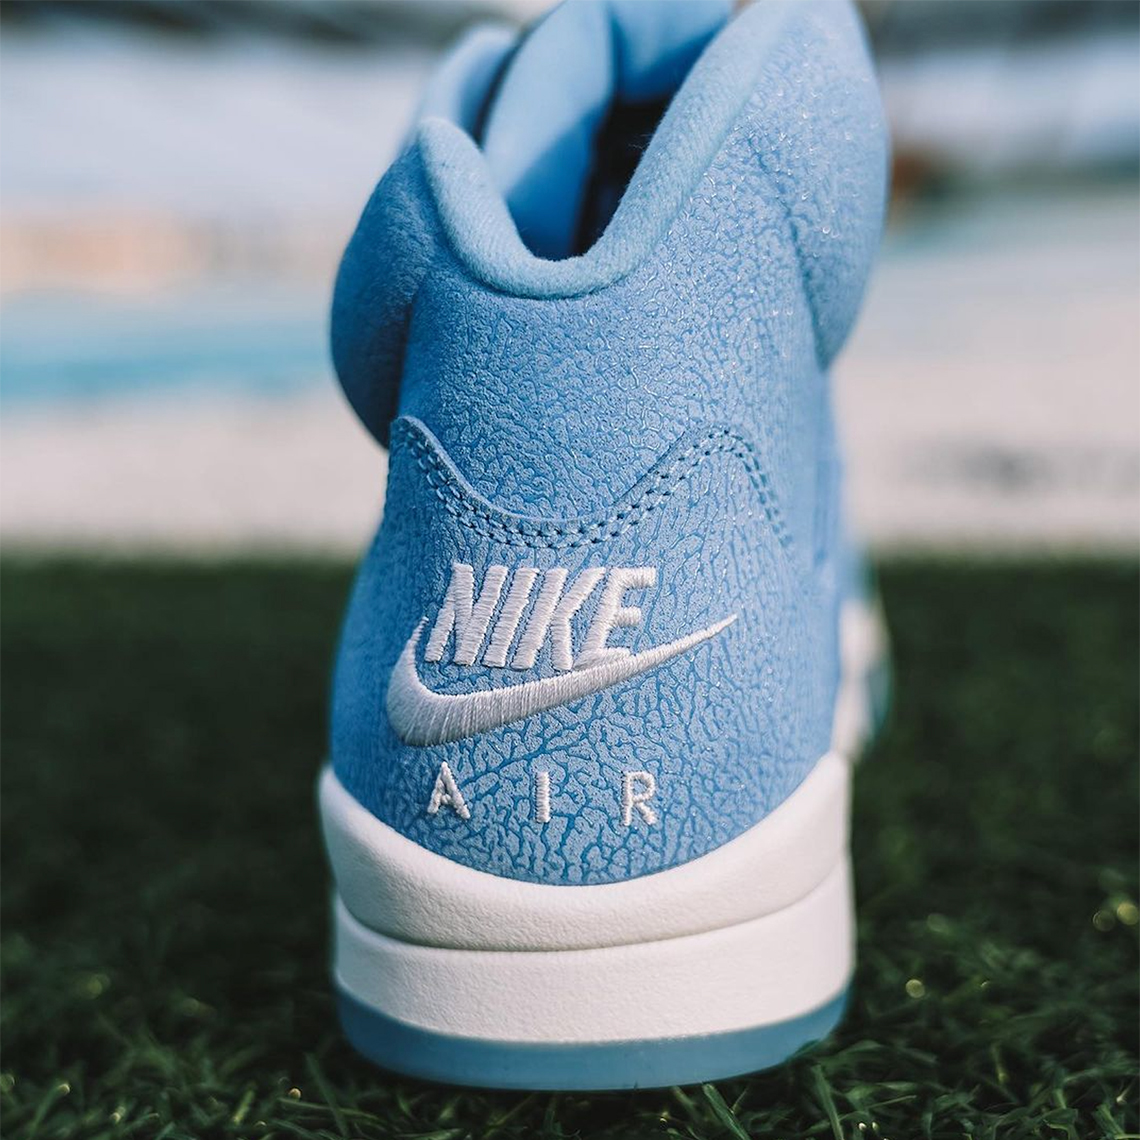 Air Jordan 5 UNC Football PE | SneakerNews.com